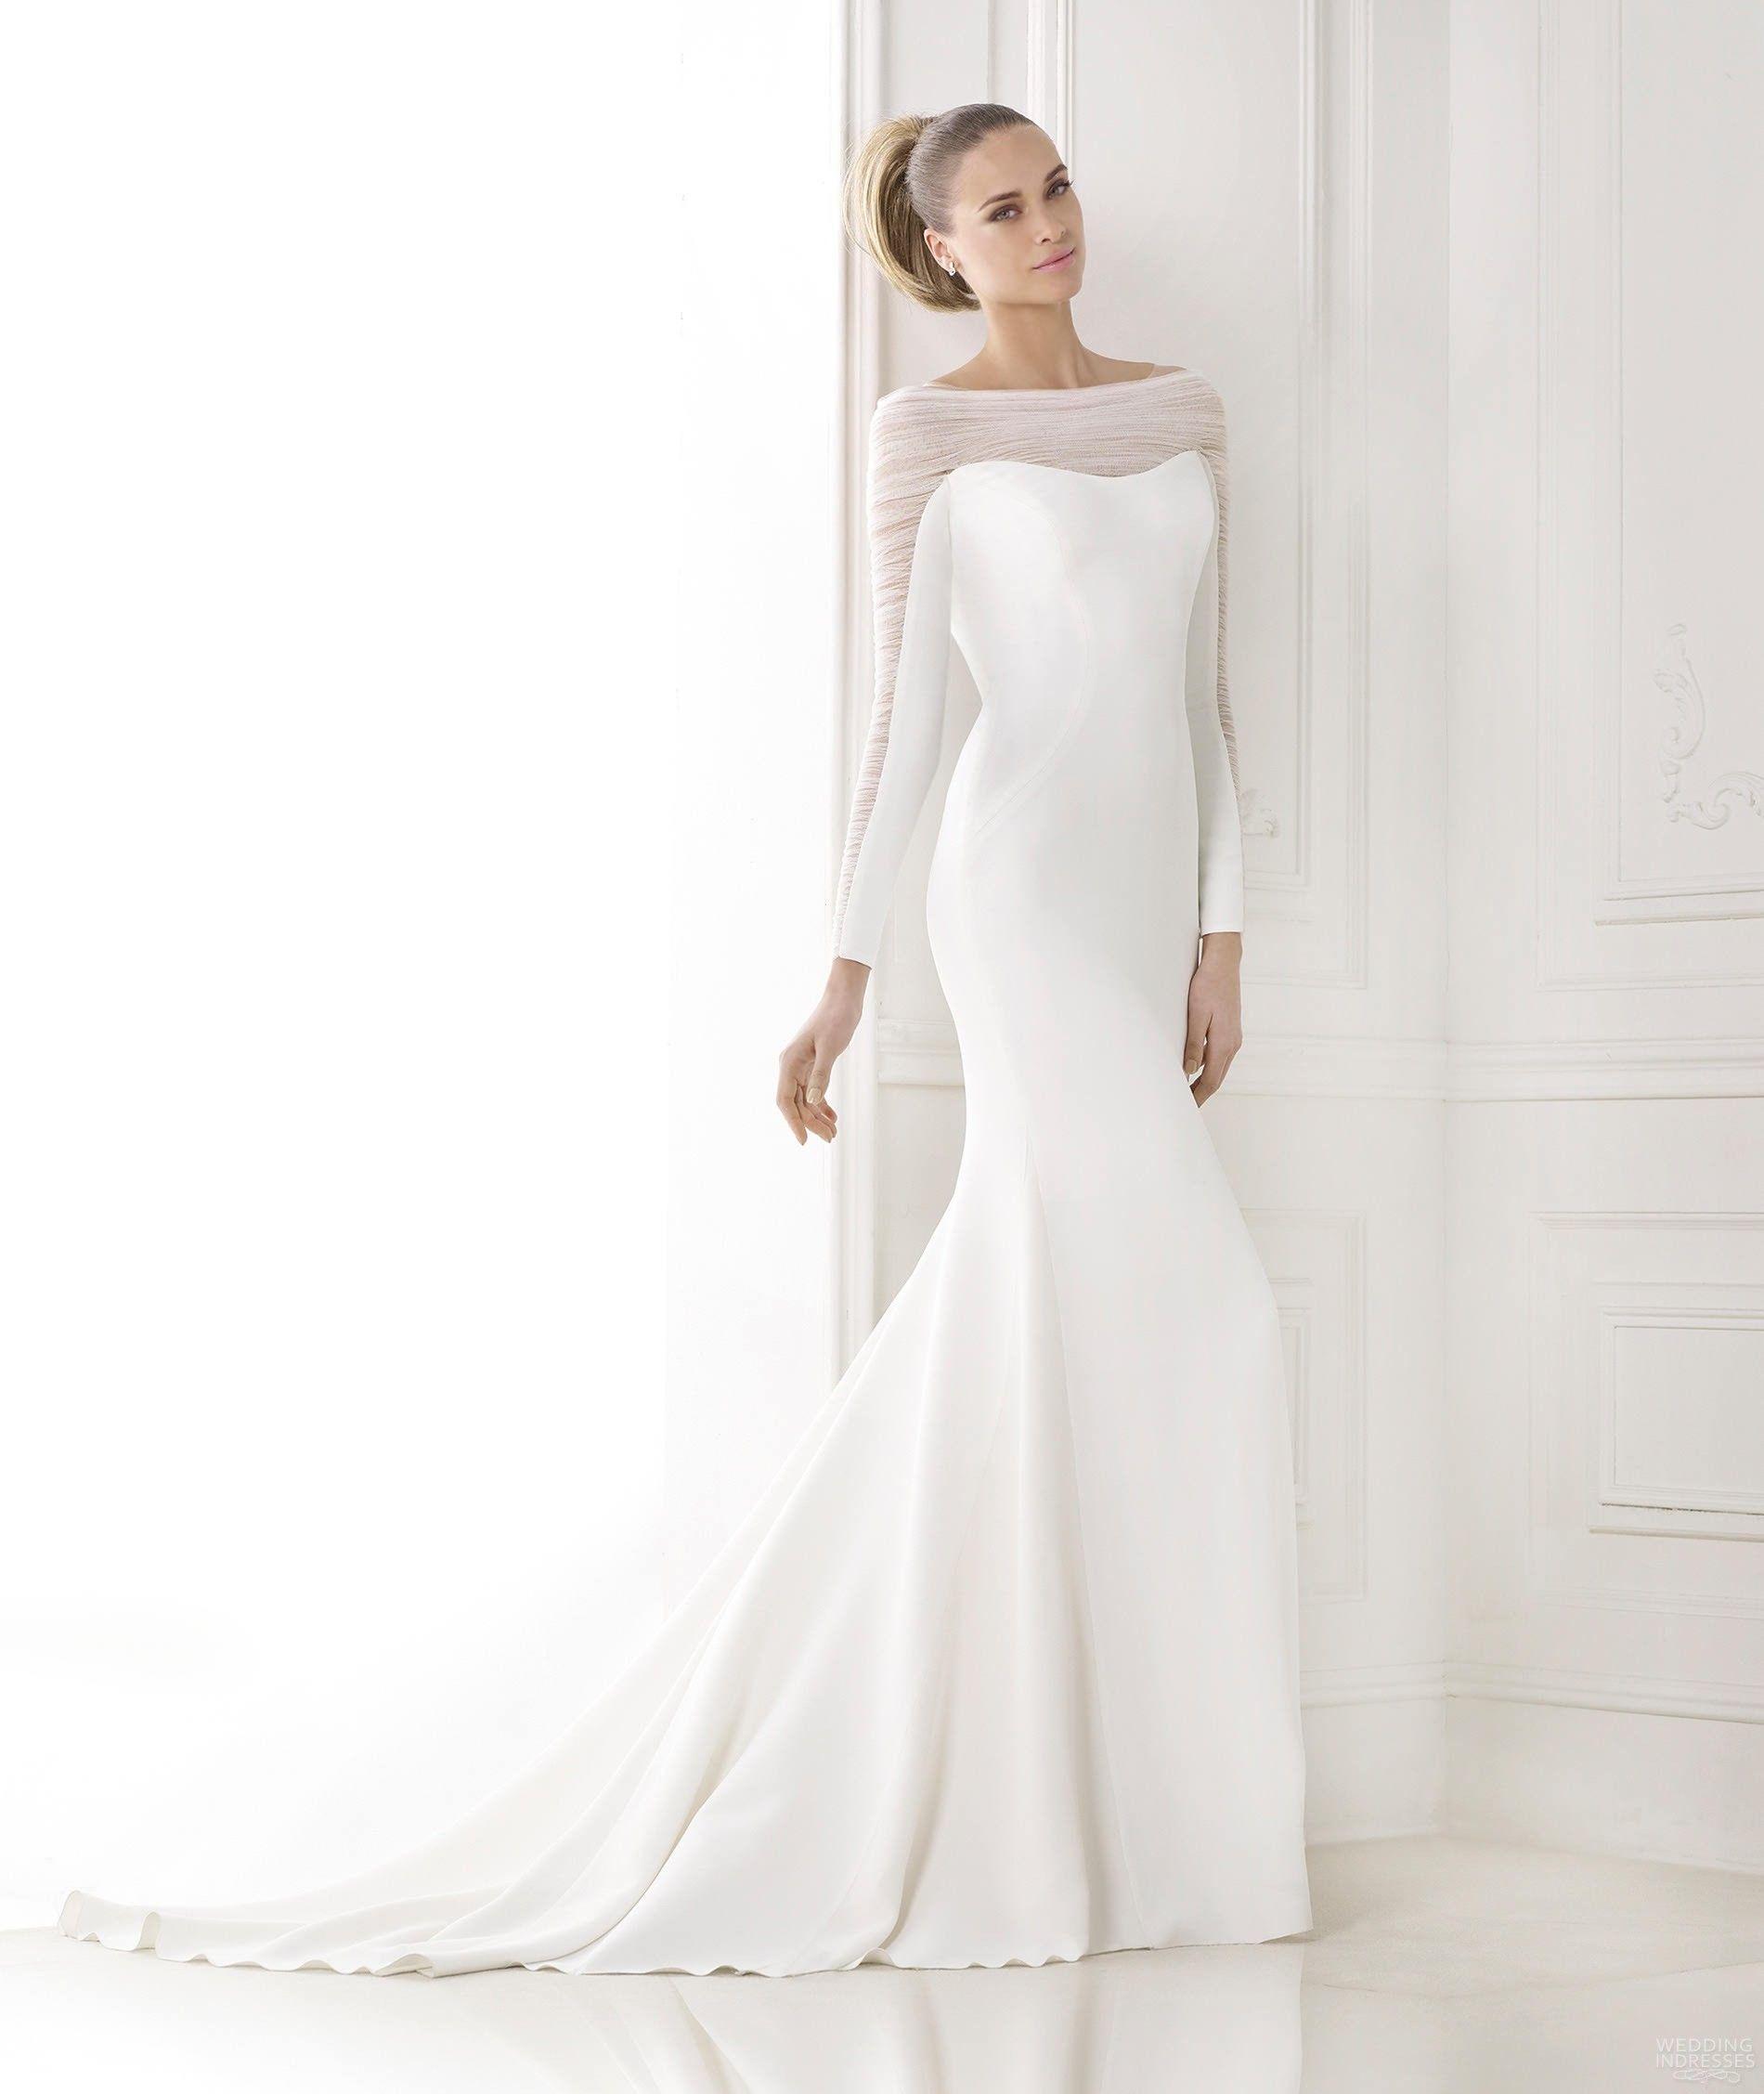 Long Sleeve Wedding Dresses Los Angeles and long sleeve wedding ...